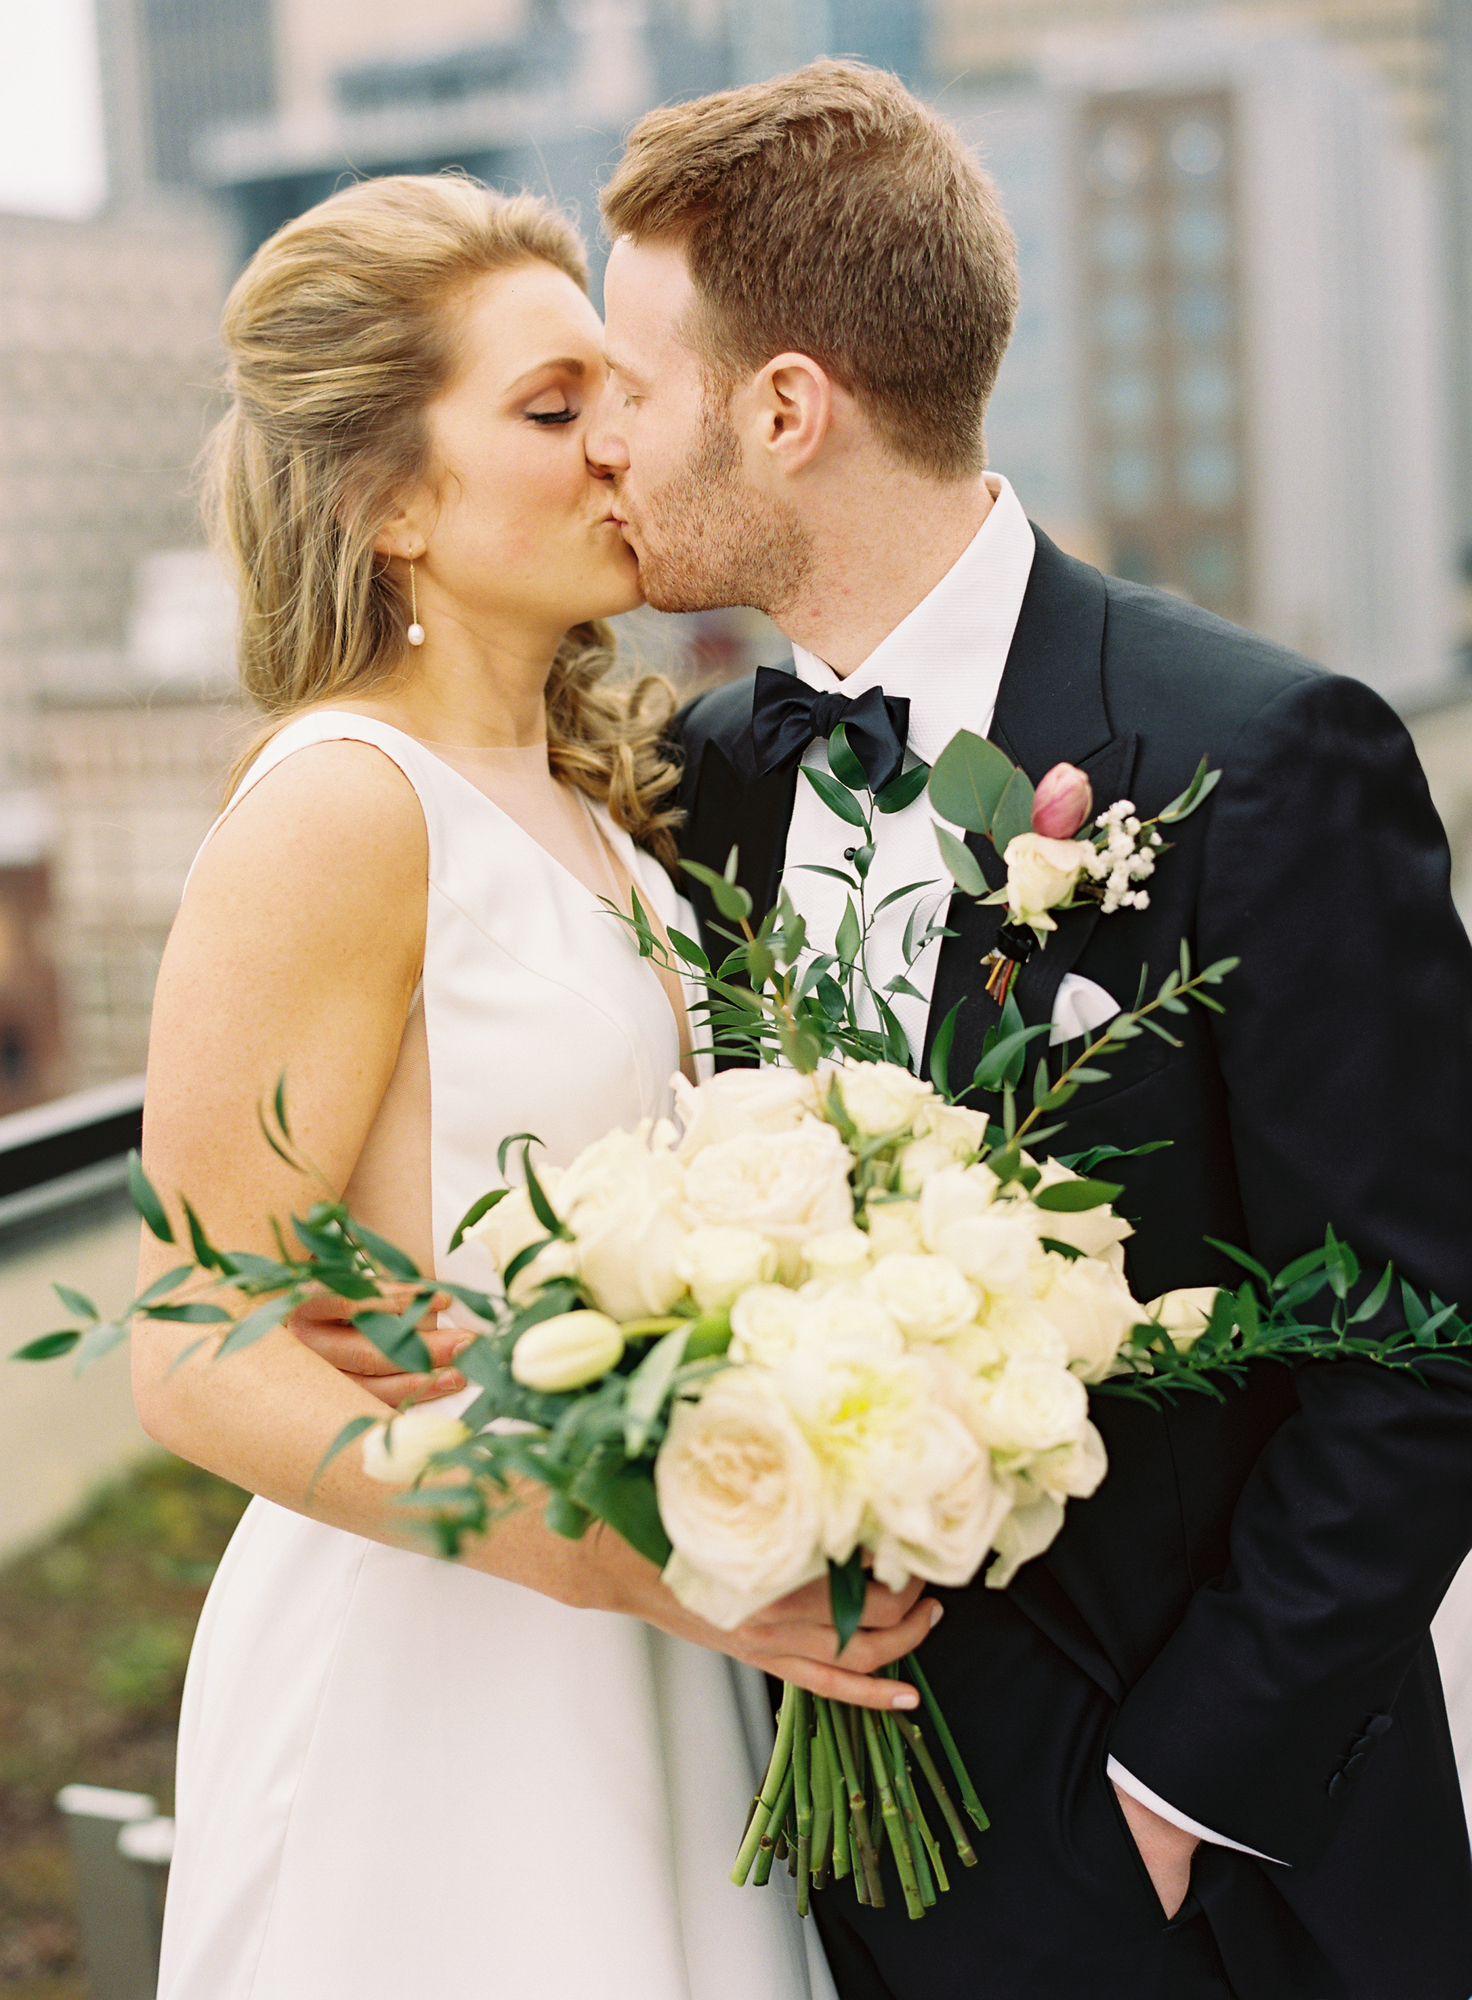 Nashville Wedding 21c Hotel and Museum-015.jpg